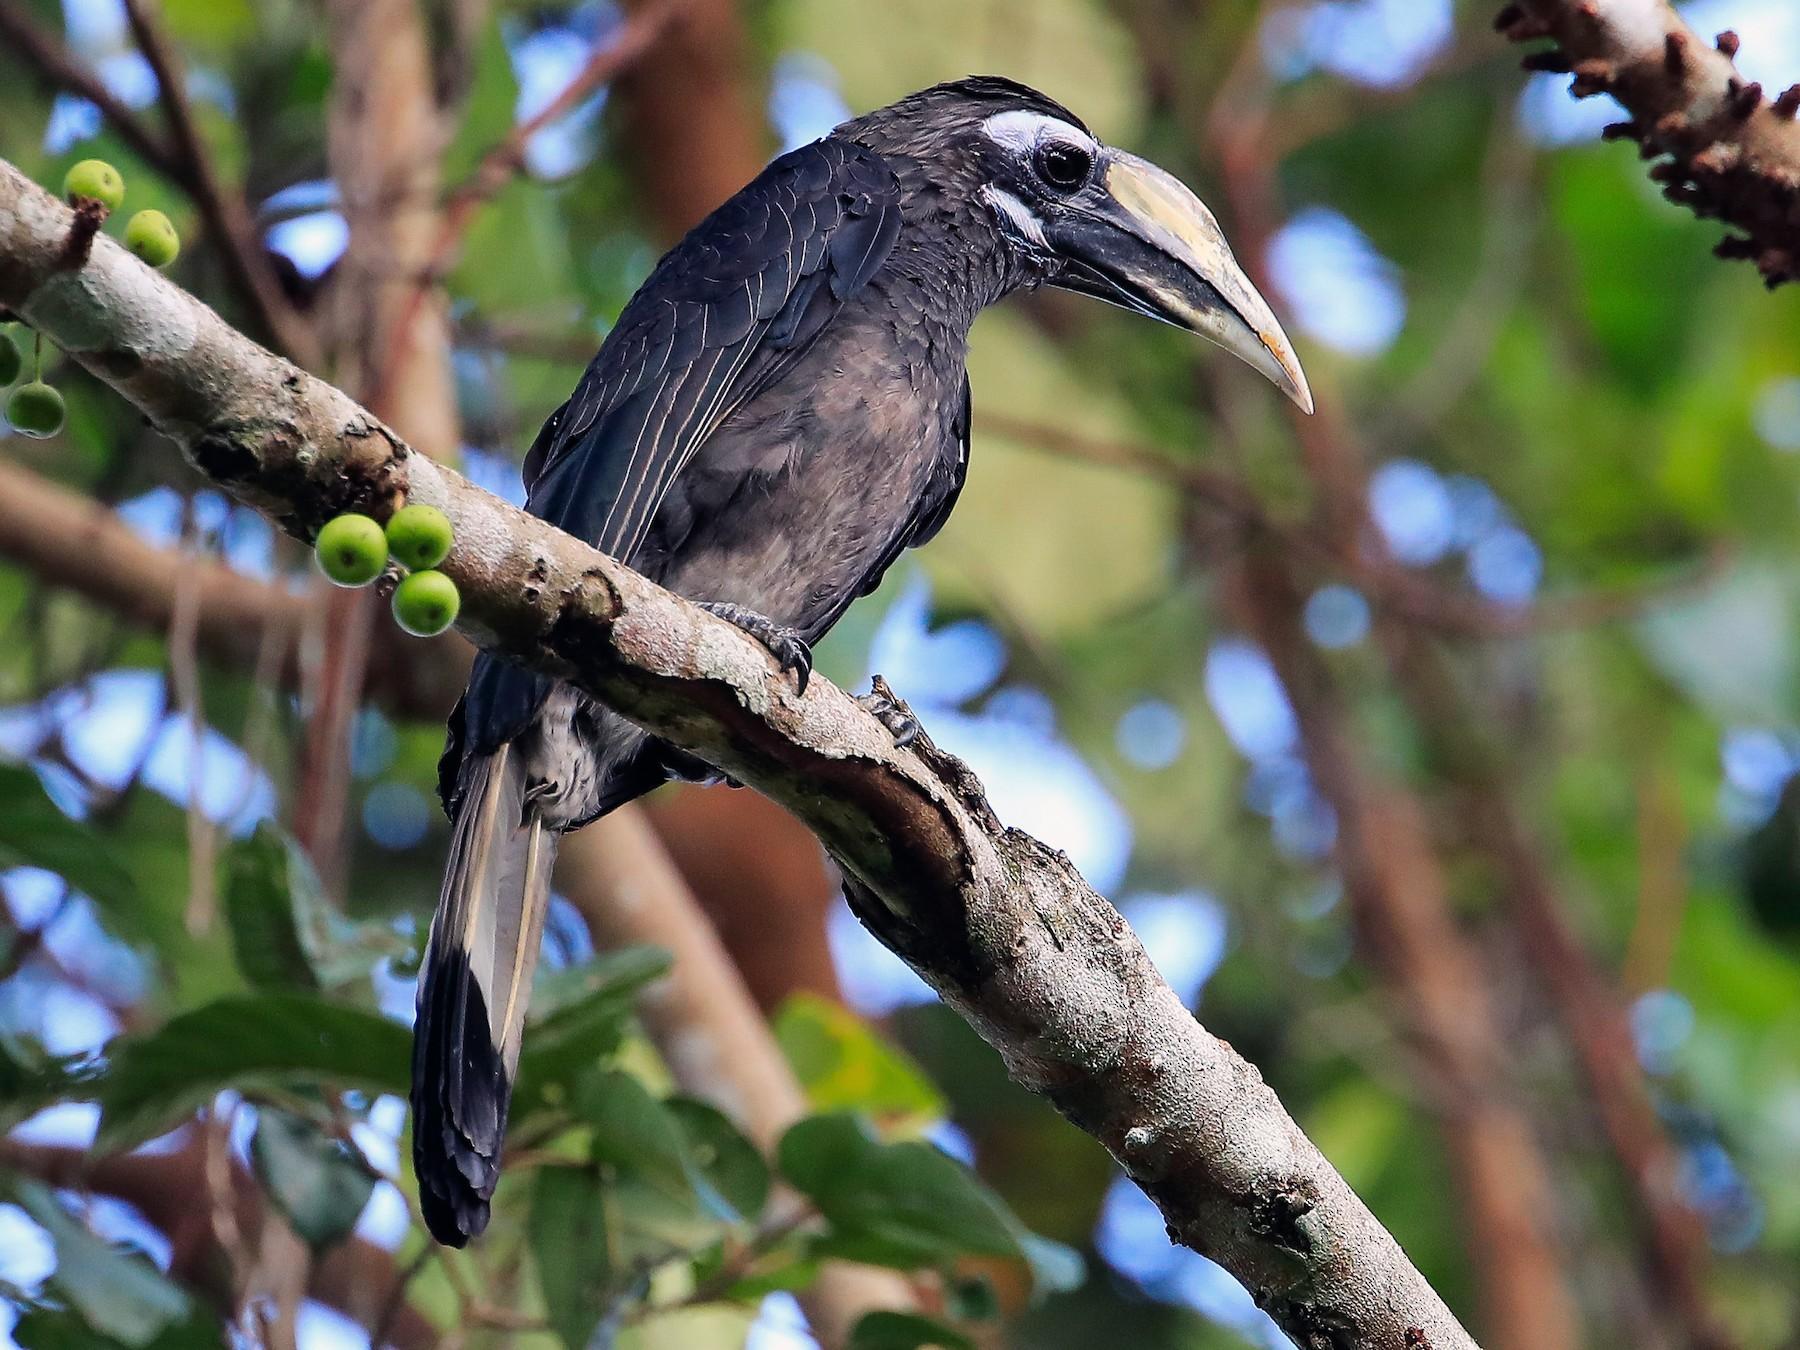 Bushy-crested Hornbill - Lefei Han